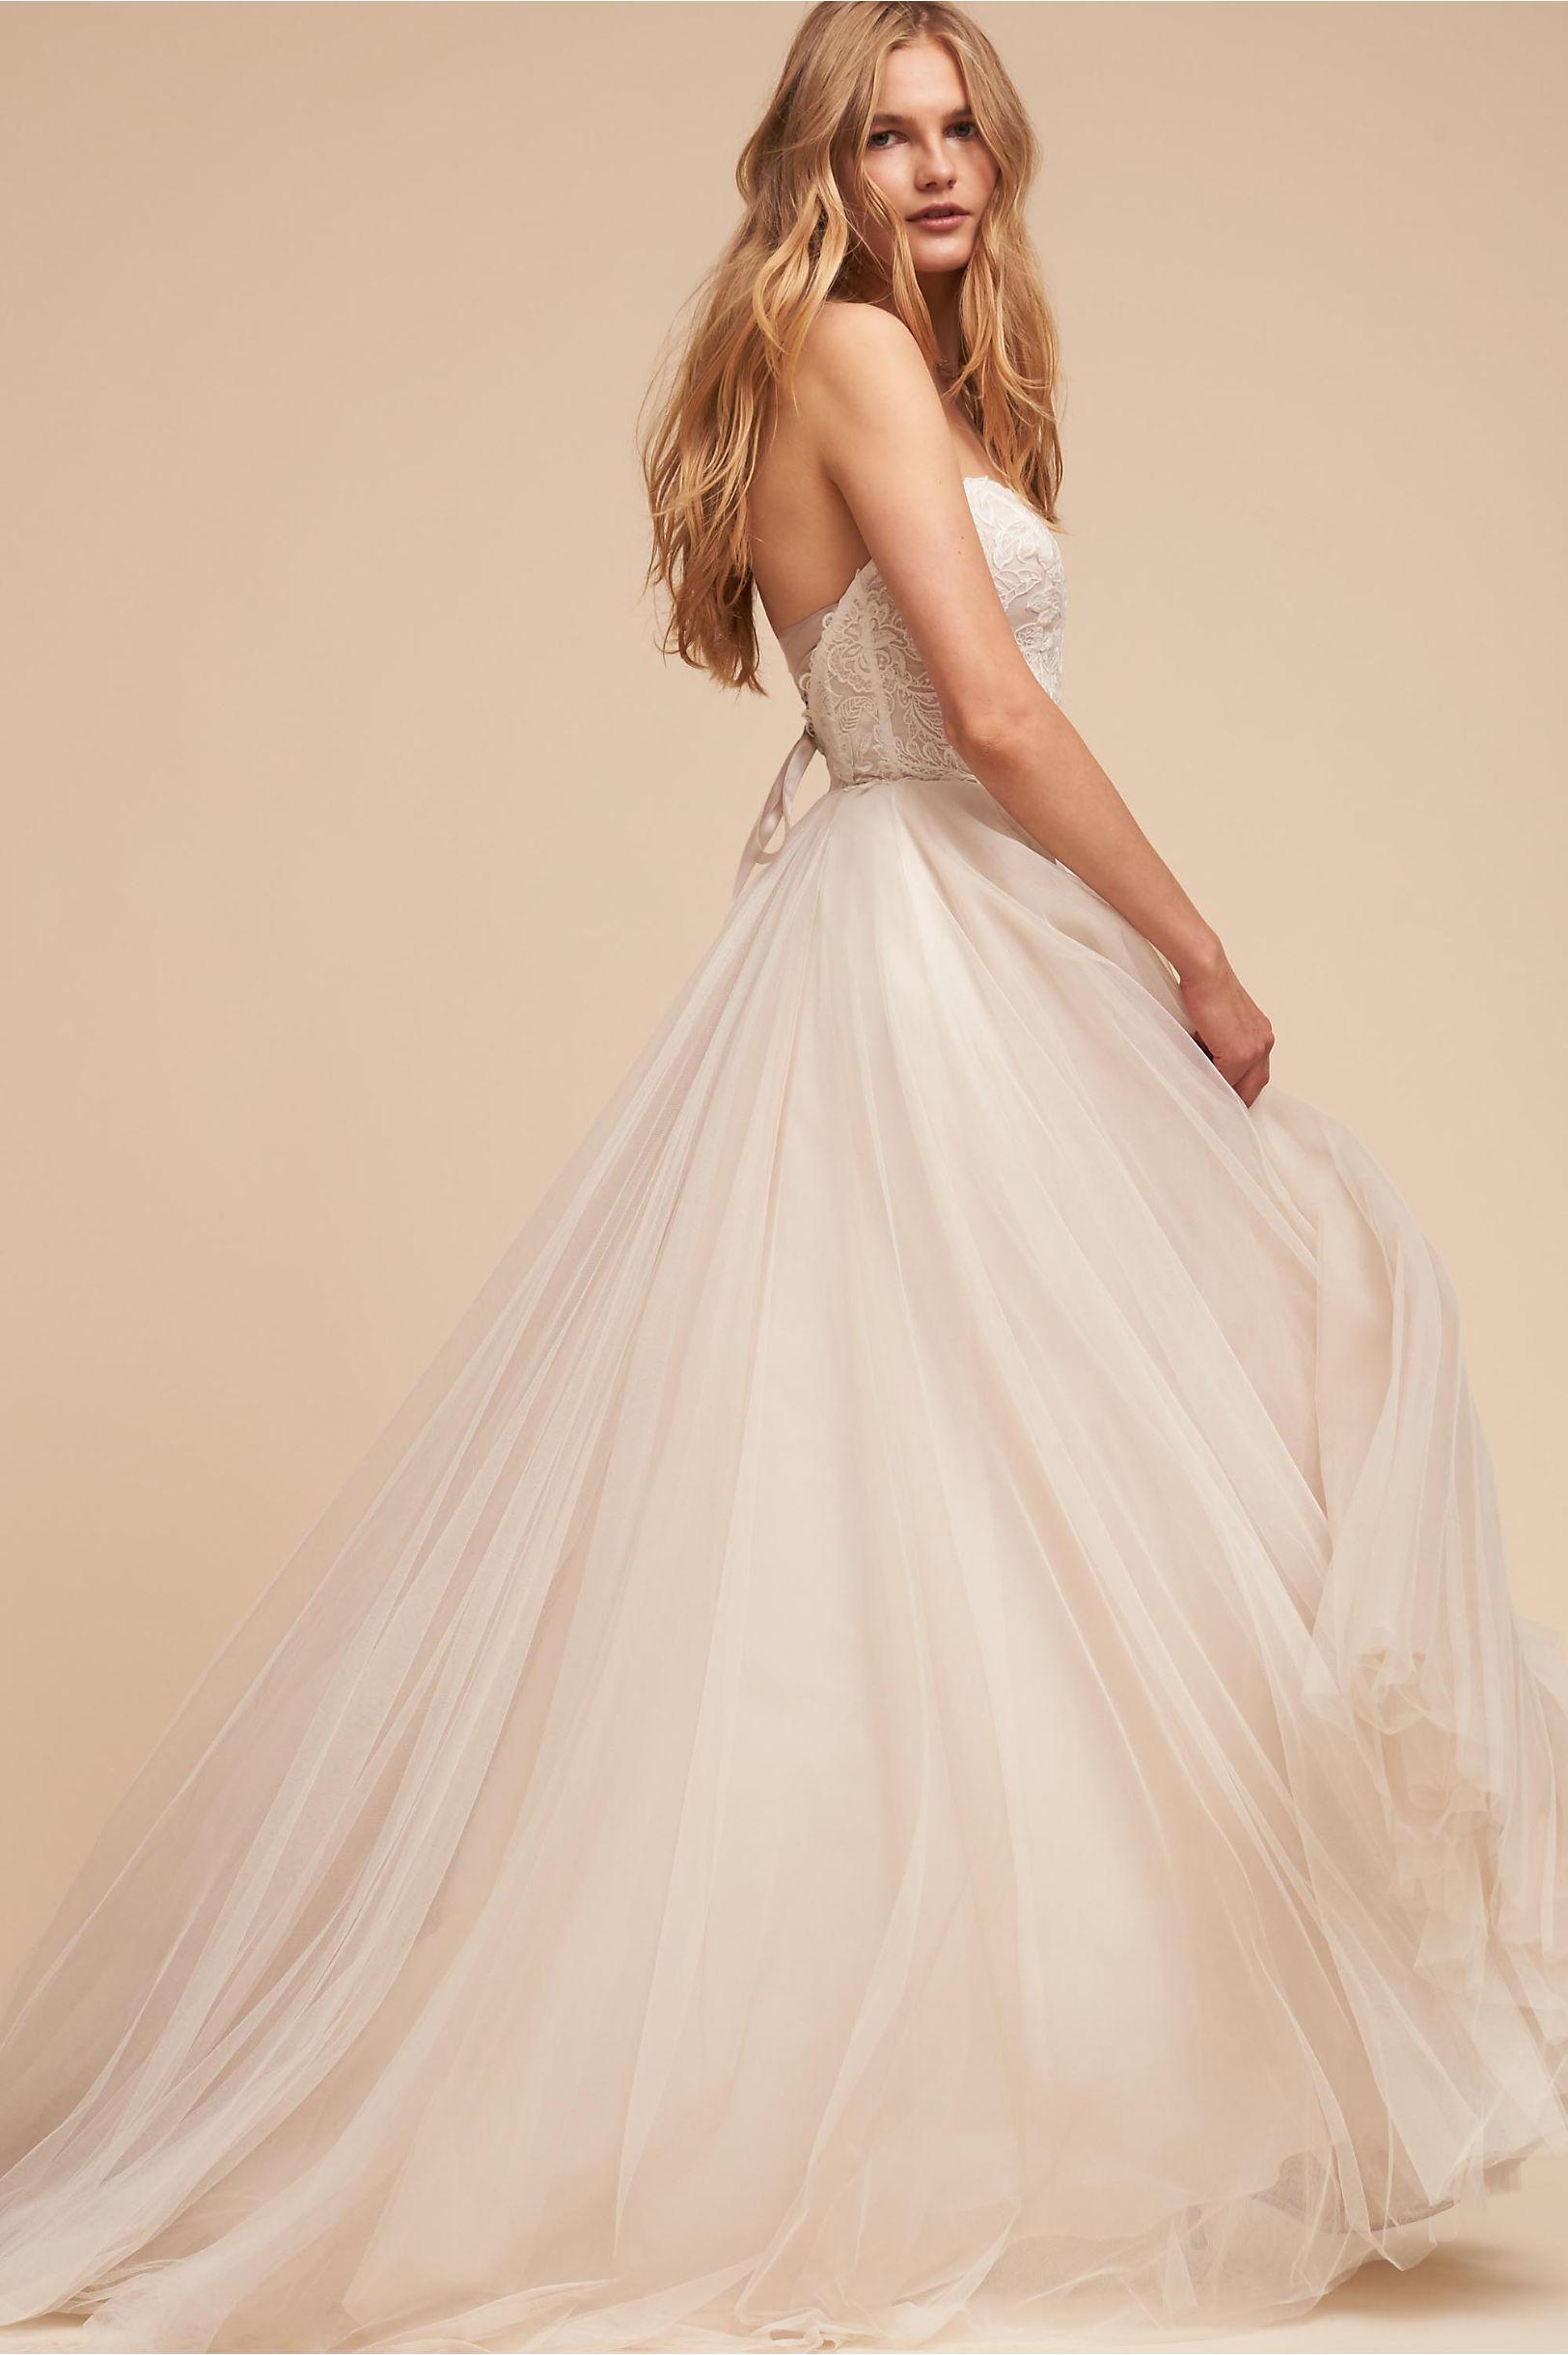 Vintage Style Wedding Dresses, Vintage Inspired Wedding Gowns Rowland Gown  AT vintagedancer.com